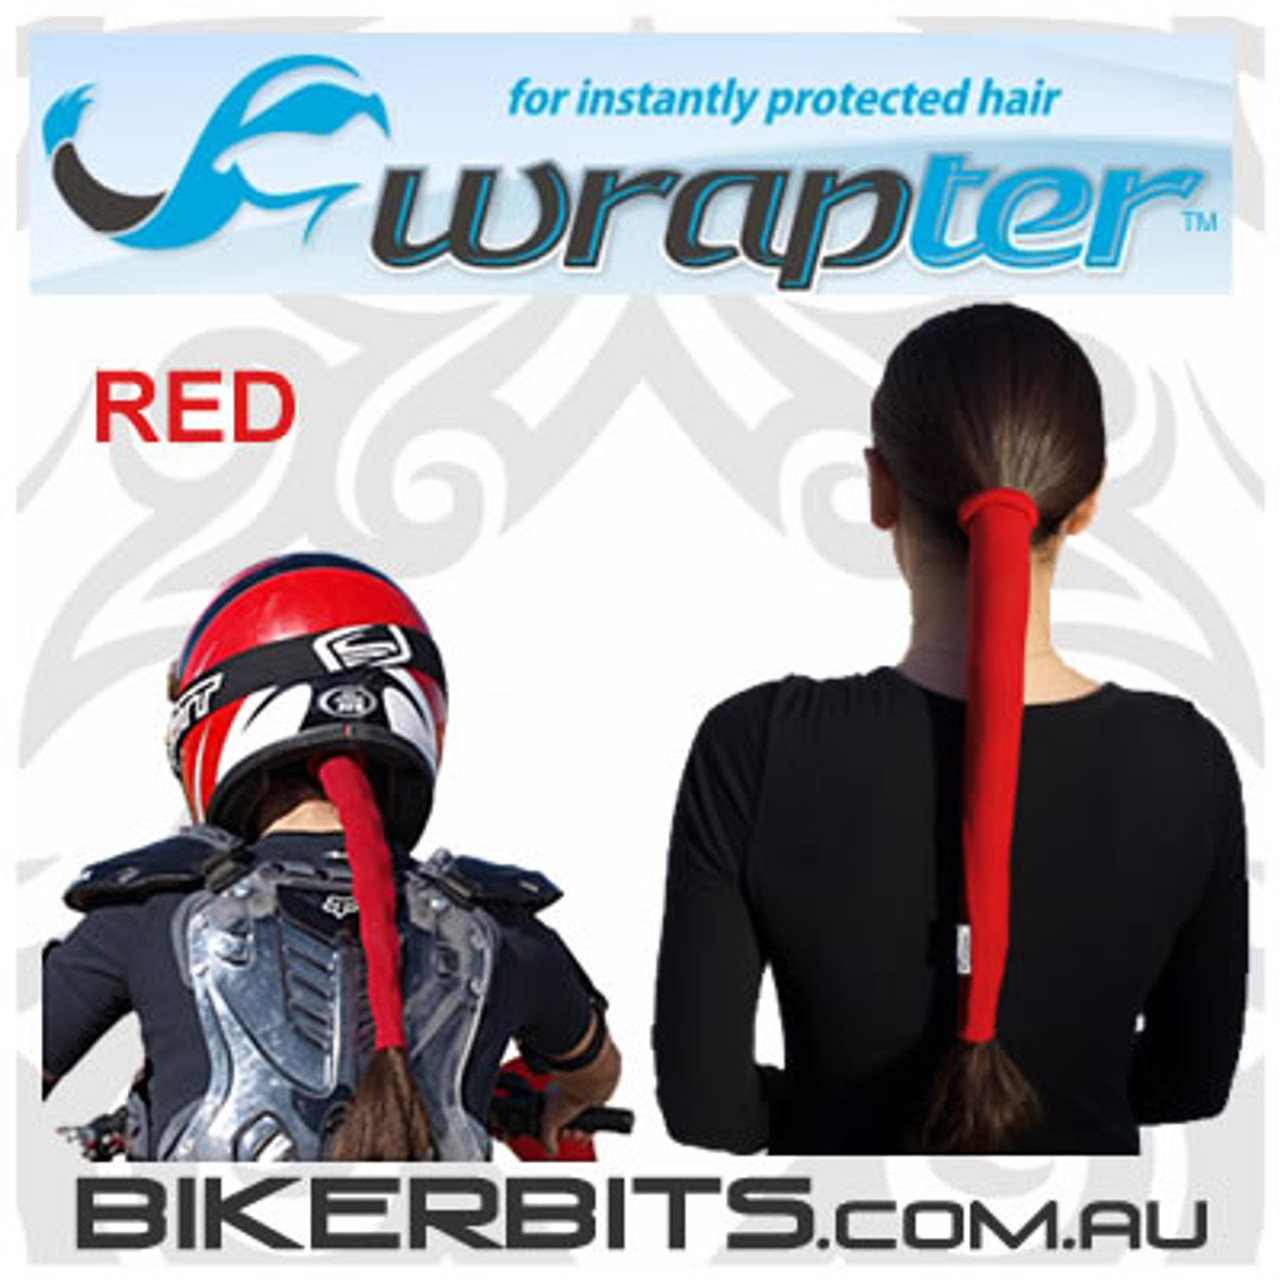 Headwear - Wrapter Hair Wrap - Red